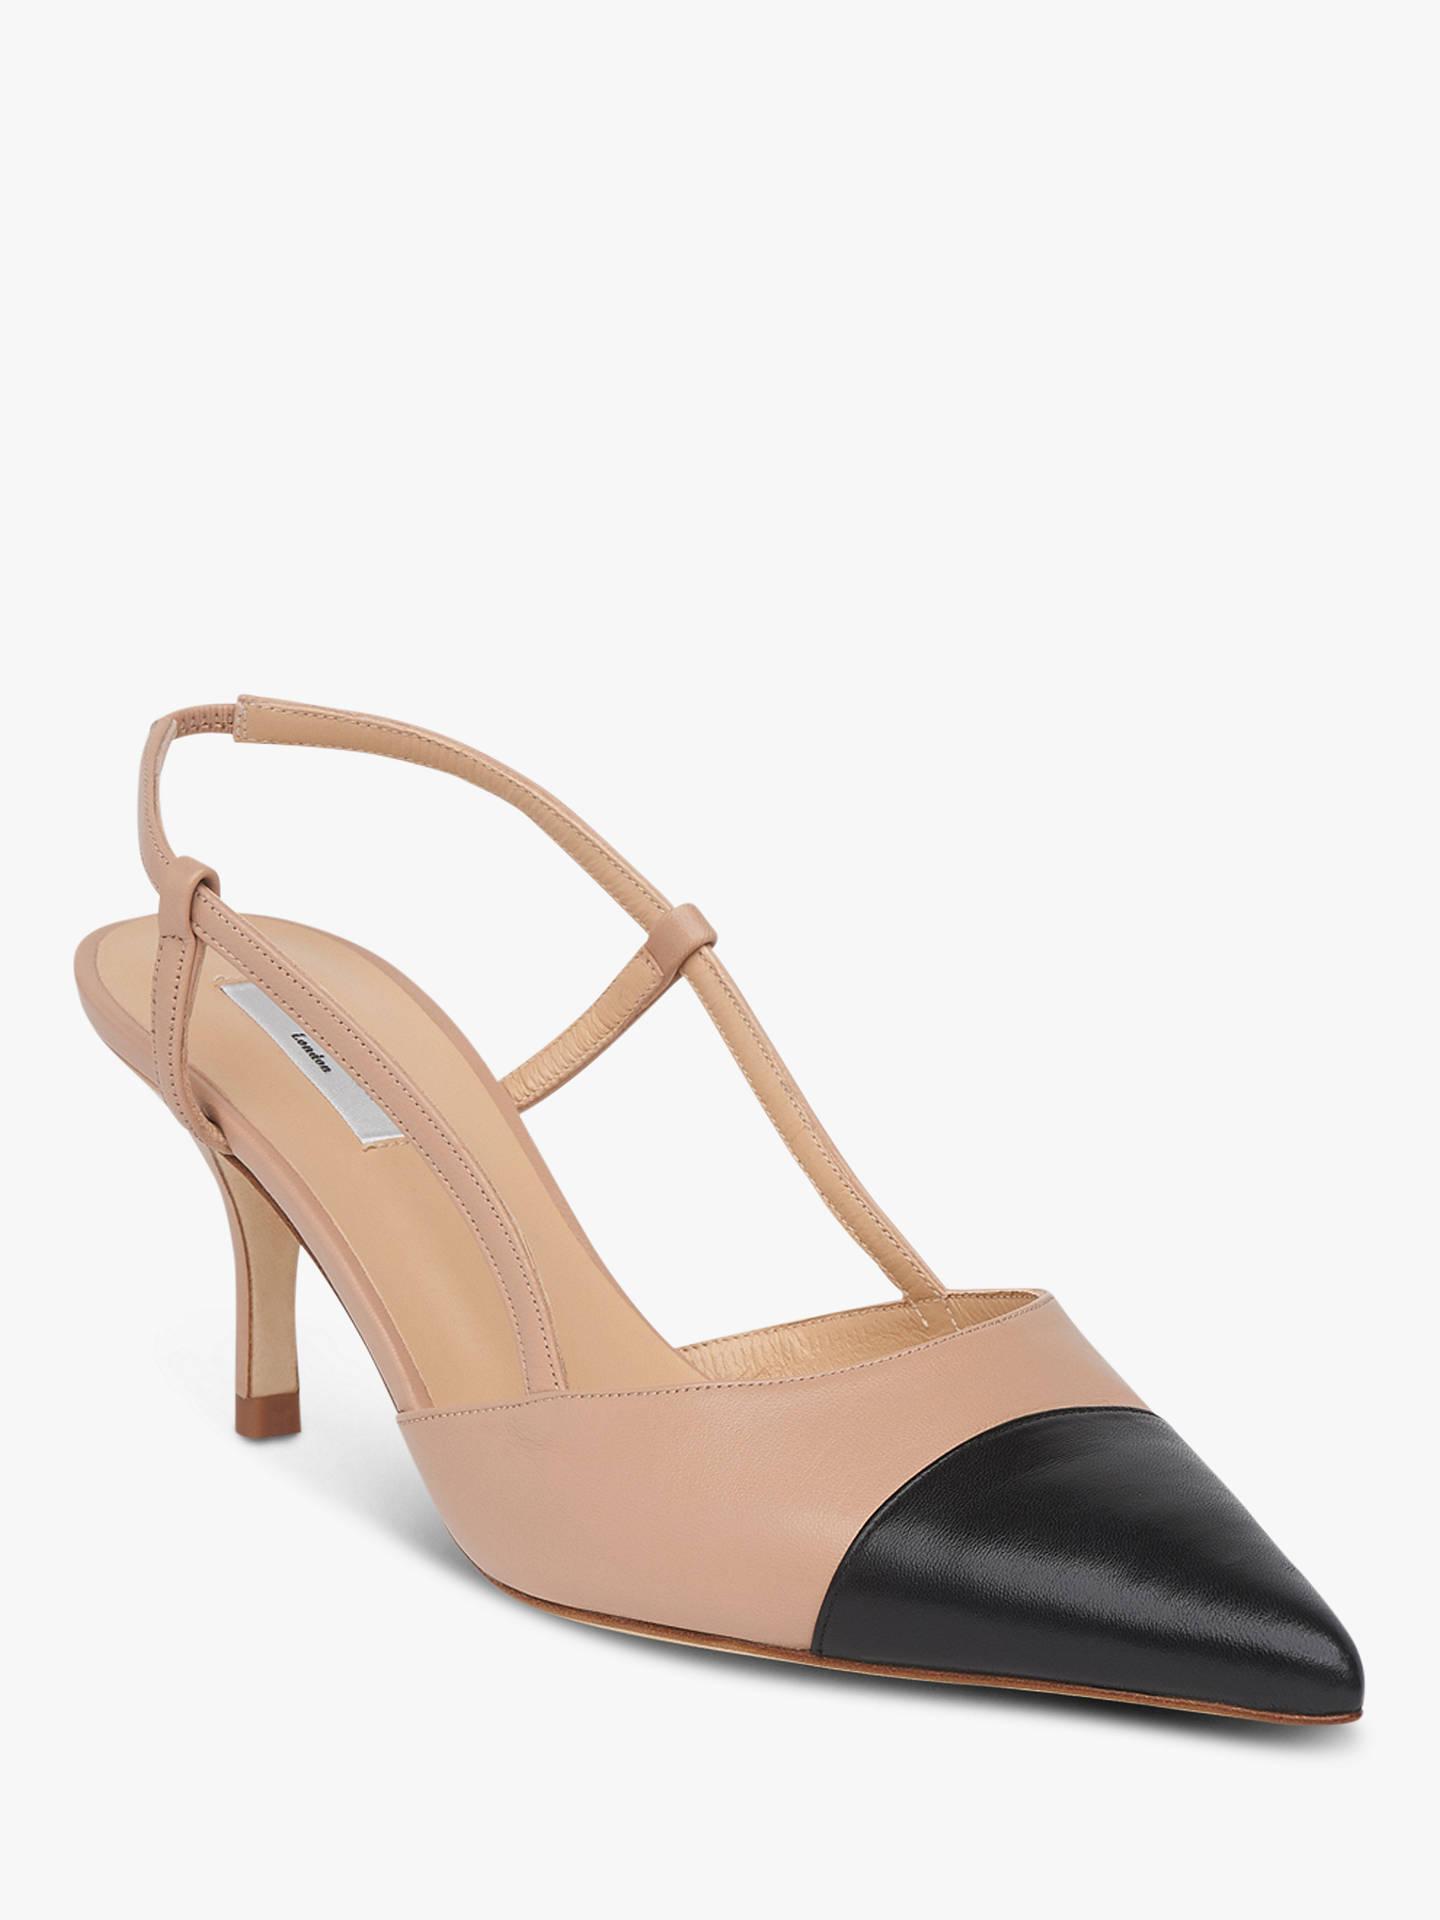 Buy L.K.Bennett Hally Open Kitten Heel Court Shoes, Beige/Black Leather, 3 Online at johnlewis.com